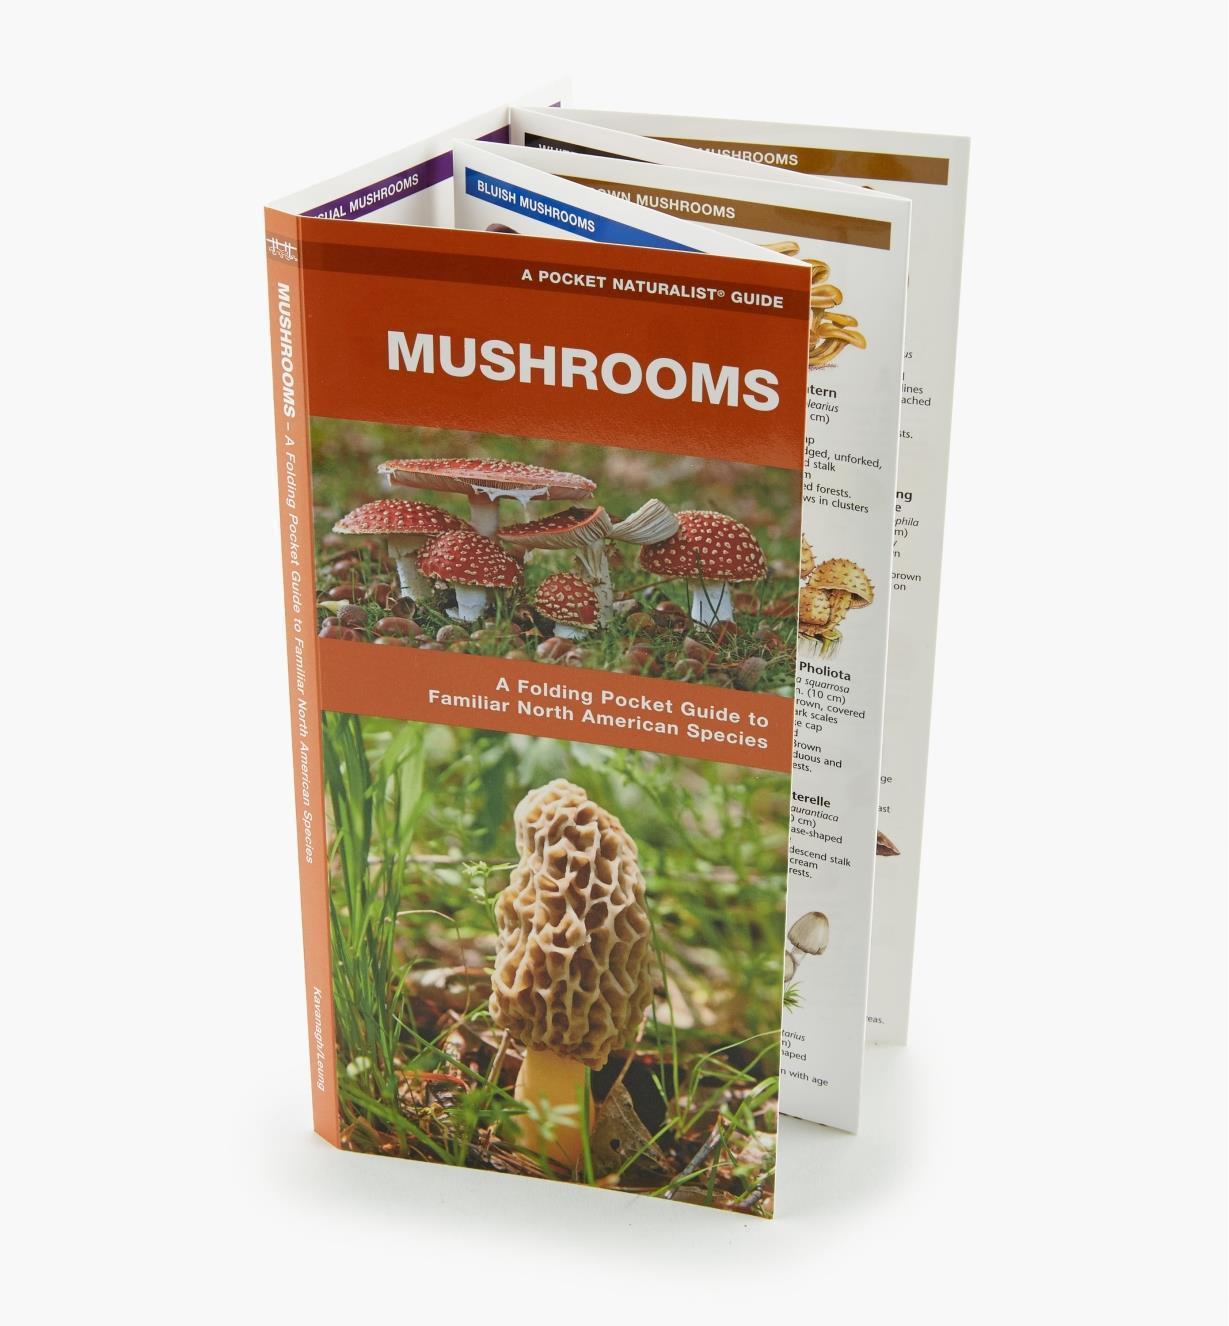 LA256 - Mushrooms Pocket Guide